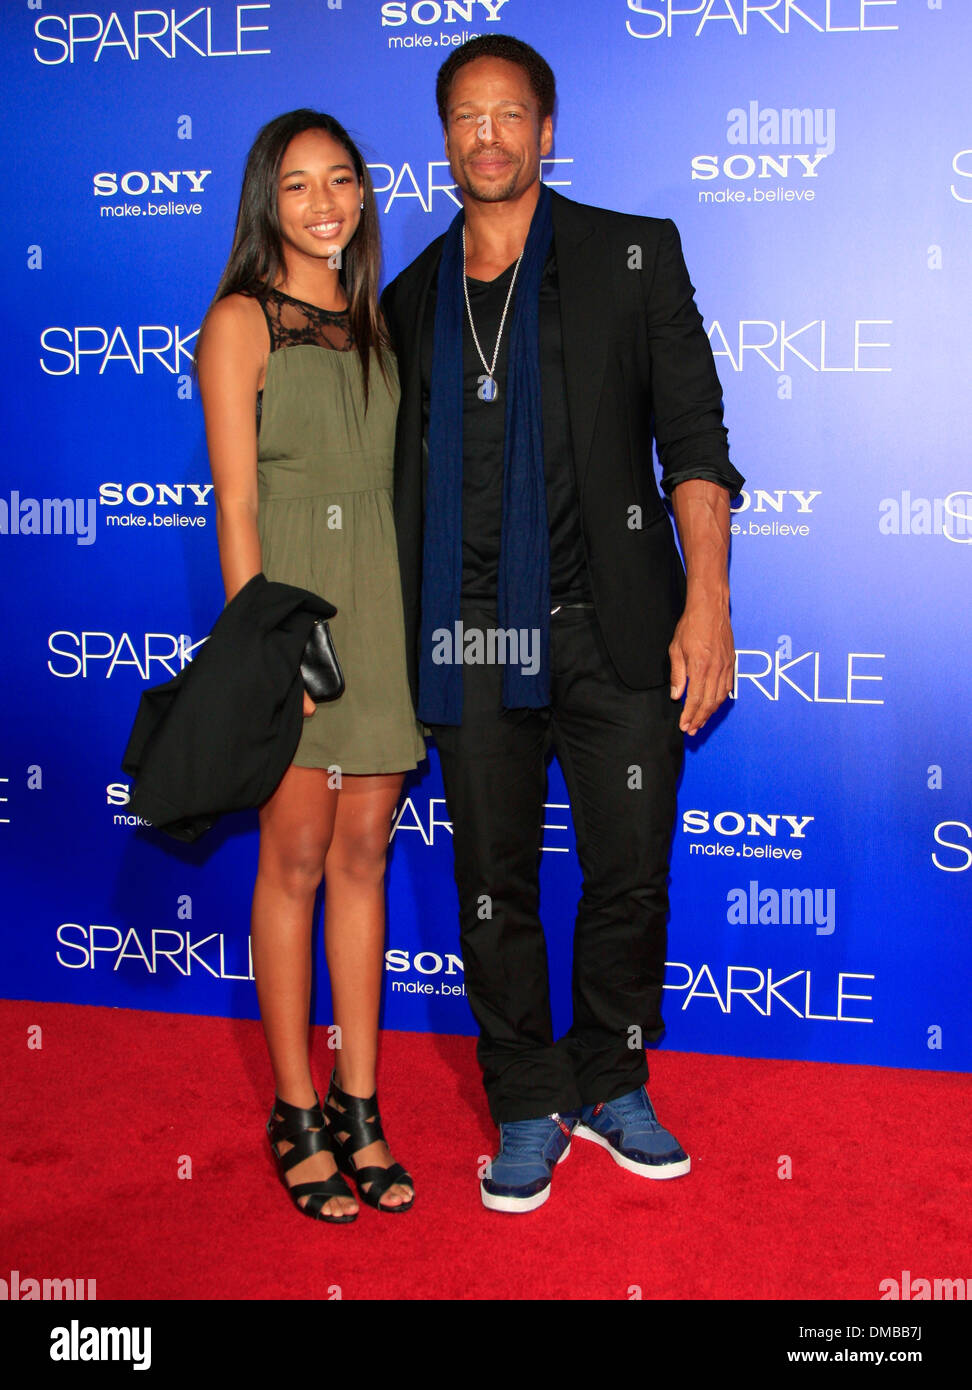 Gary Dourdan Los Angeles Premiere of 'Sparkle' - Inside Arrivals Los Angeles California - 16.08.12 Stock Photo